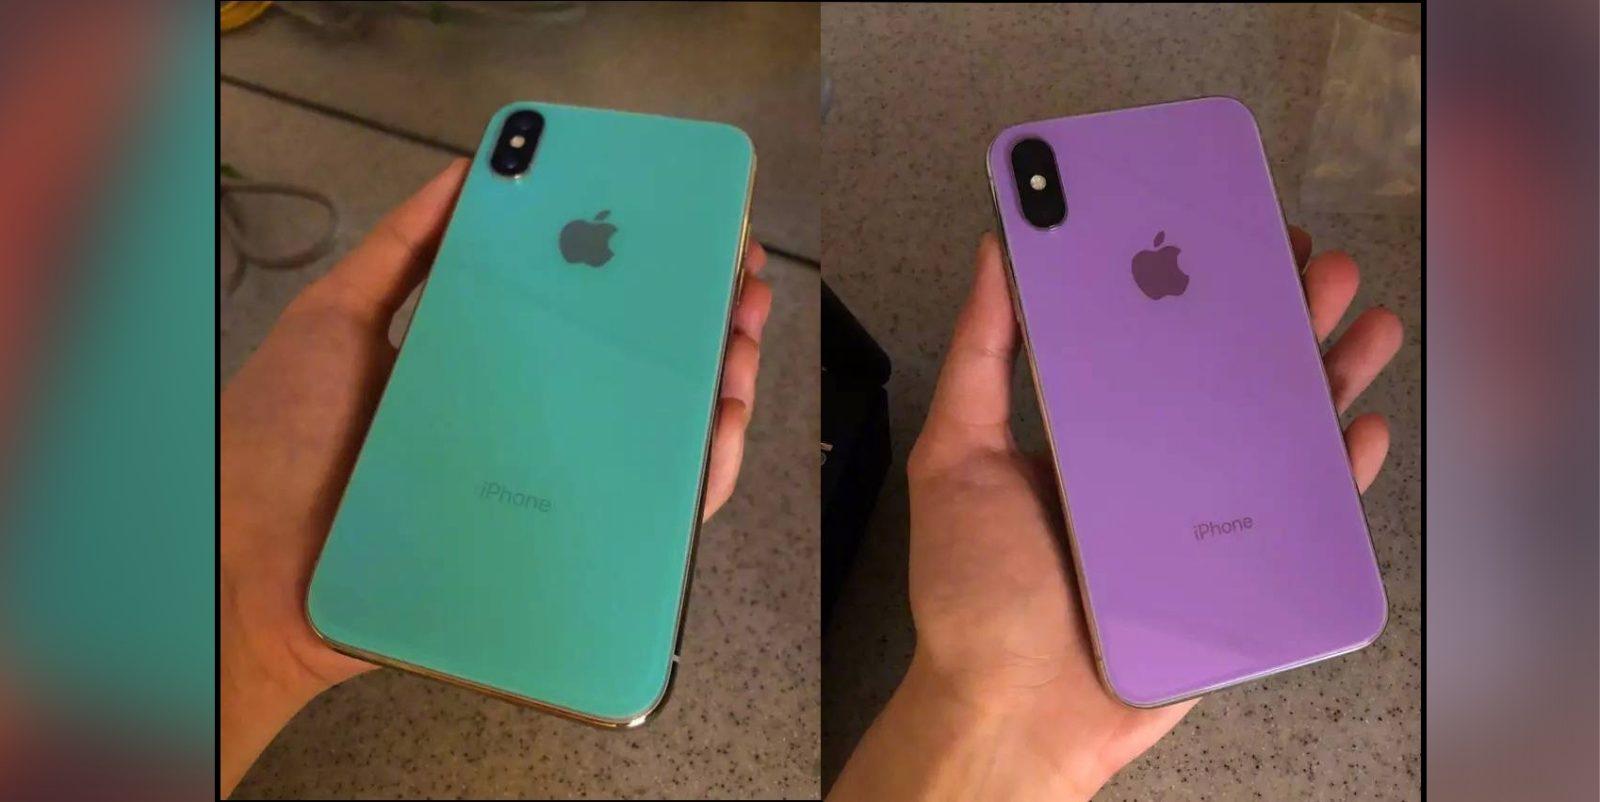 Un iPhone X de color